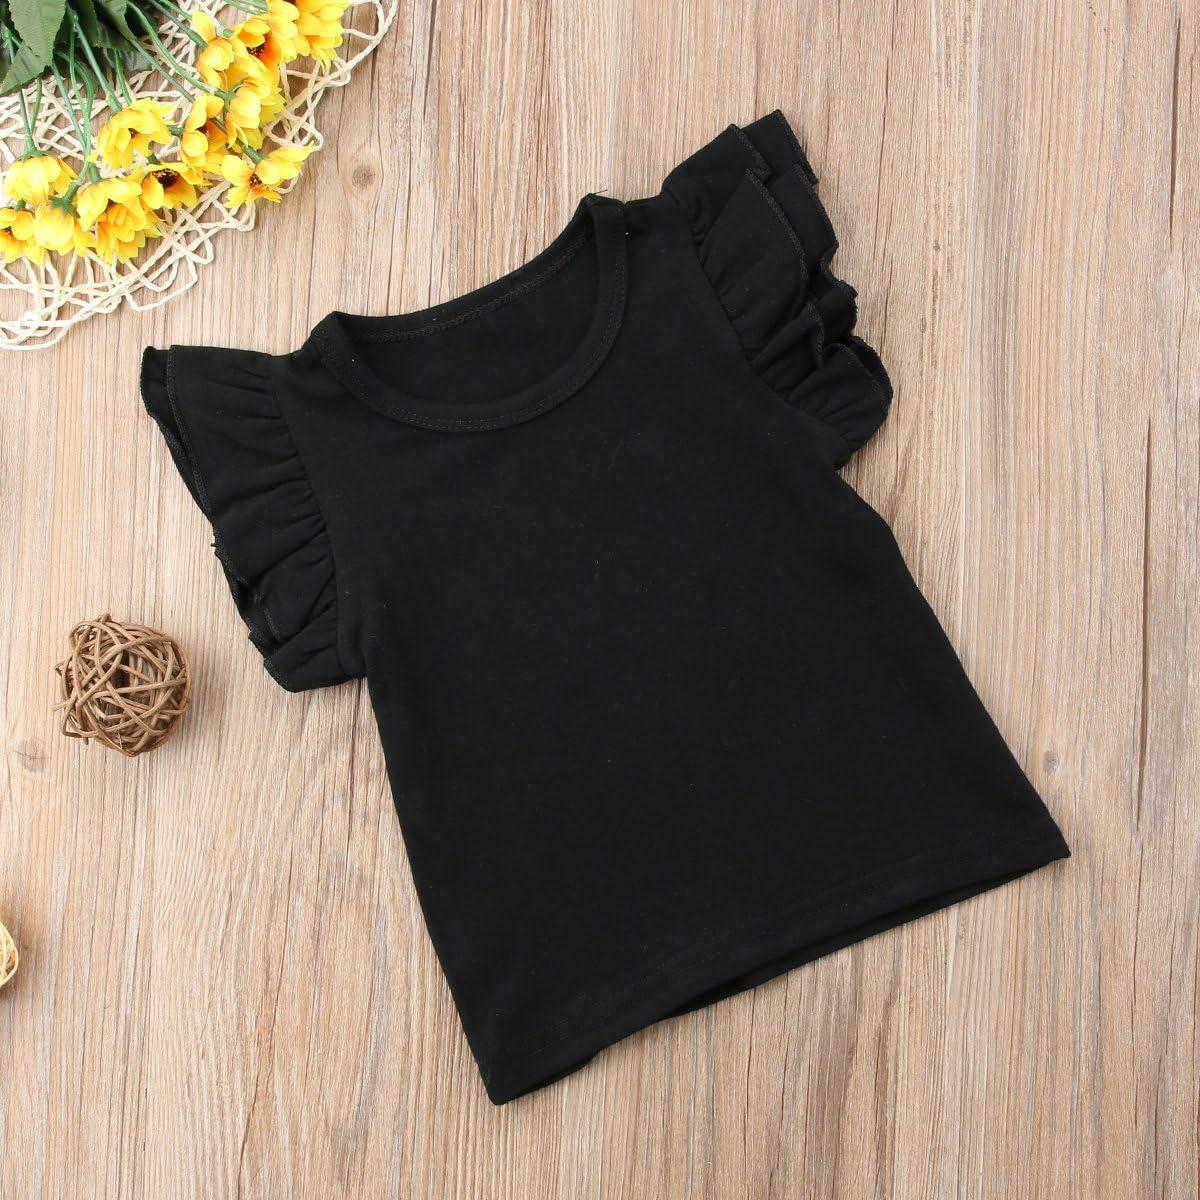 artbiti 6 Styles Toddler Baby Girls Tee Basic Plain Ruffle Short Sleeve T-Shirt Top Blouse Clothes